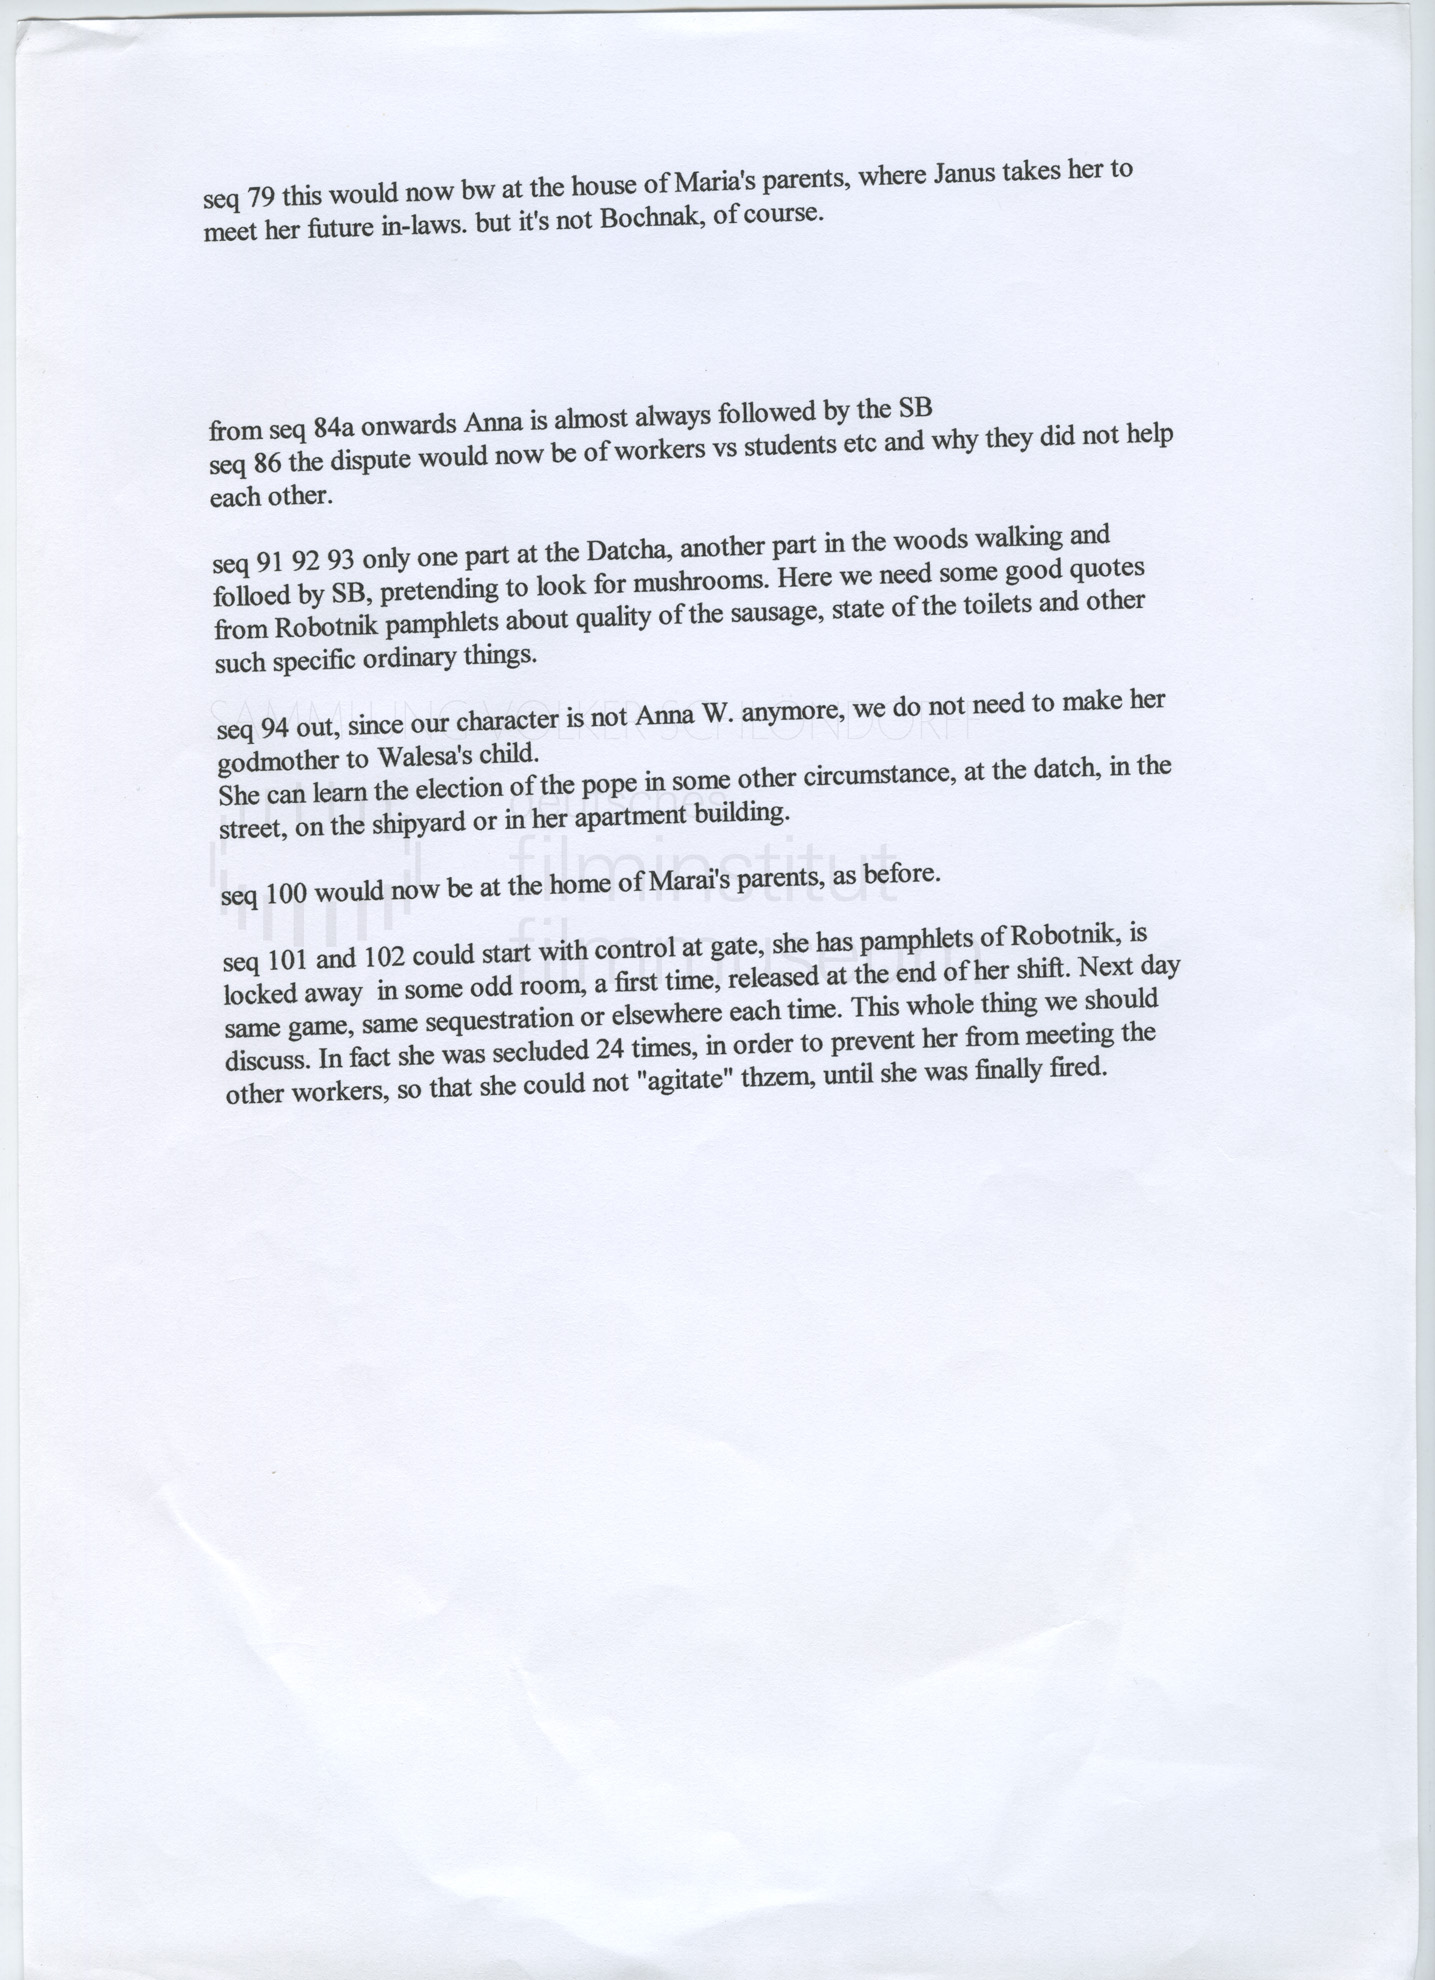 STRAJK // Produktionsmaterial / Drehbuchnotizen, 1b